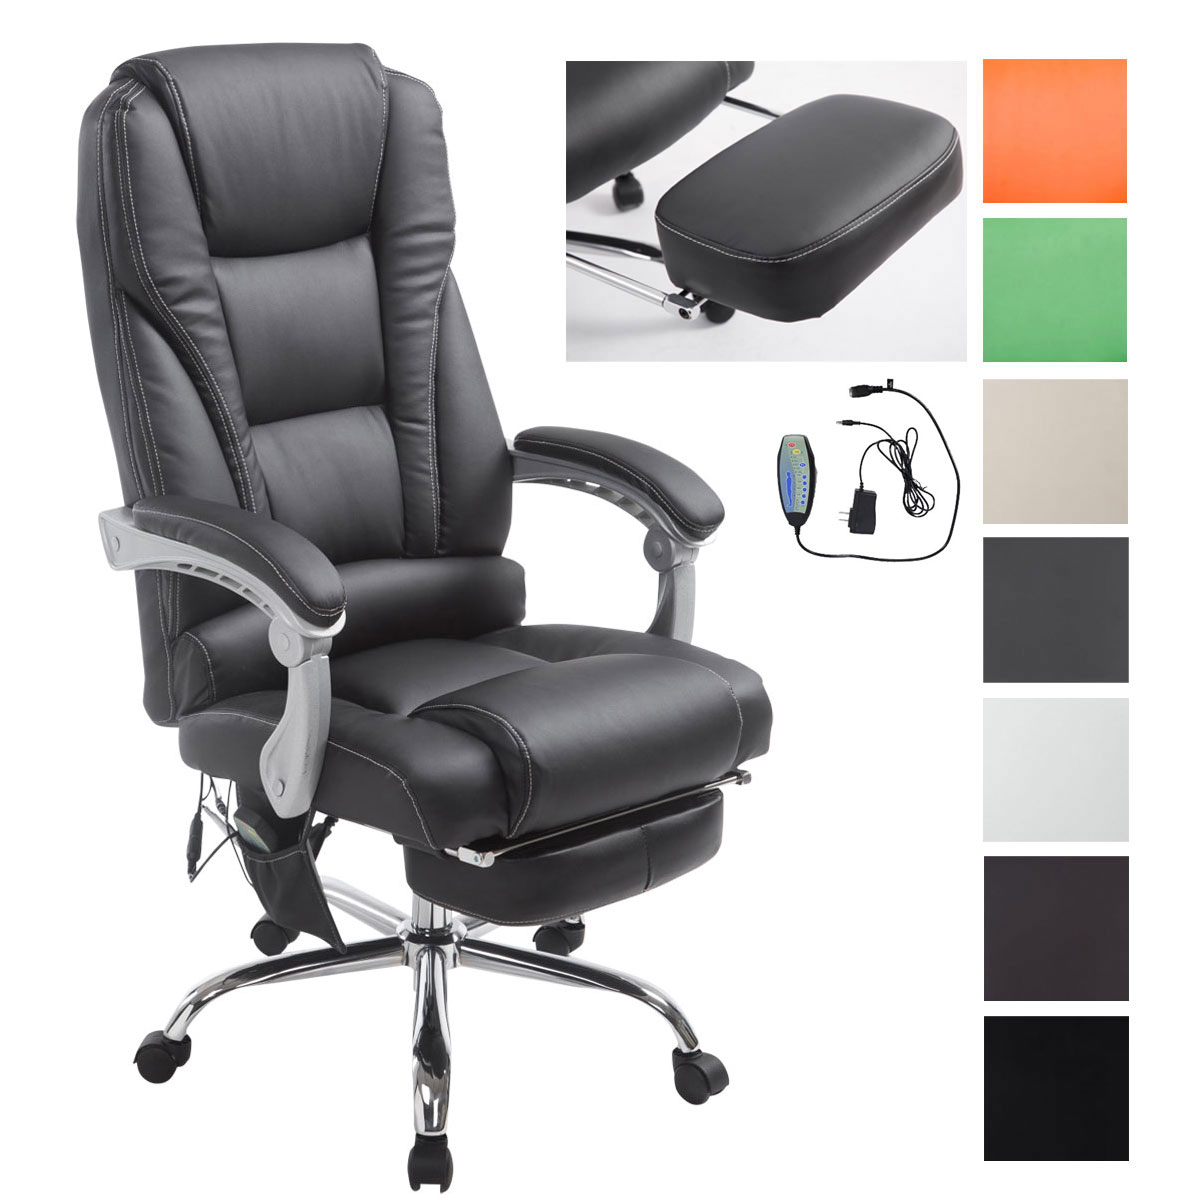 b rostuhl pacific mit massagefunktion chefsessel b rosessel fu st tze integriert ebay. Black Bedroom Furniture Sets. Home Design Ideas